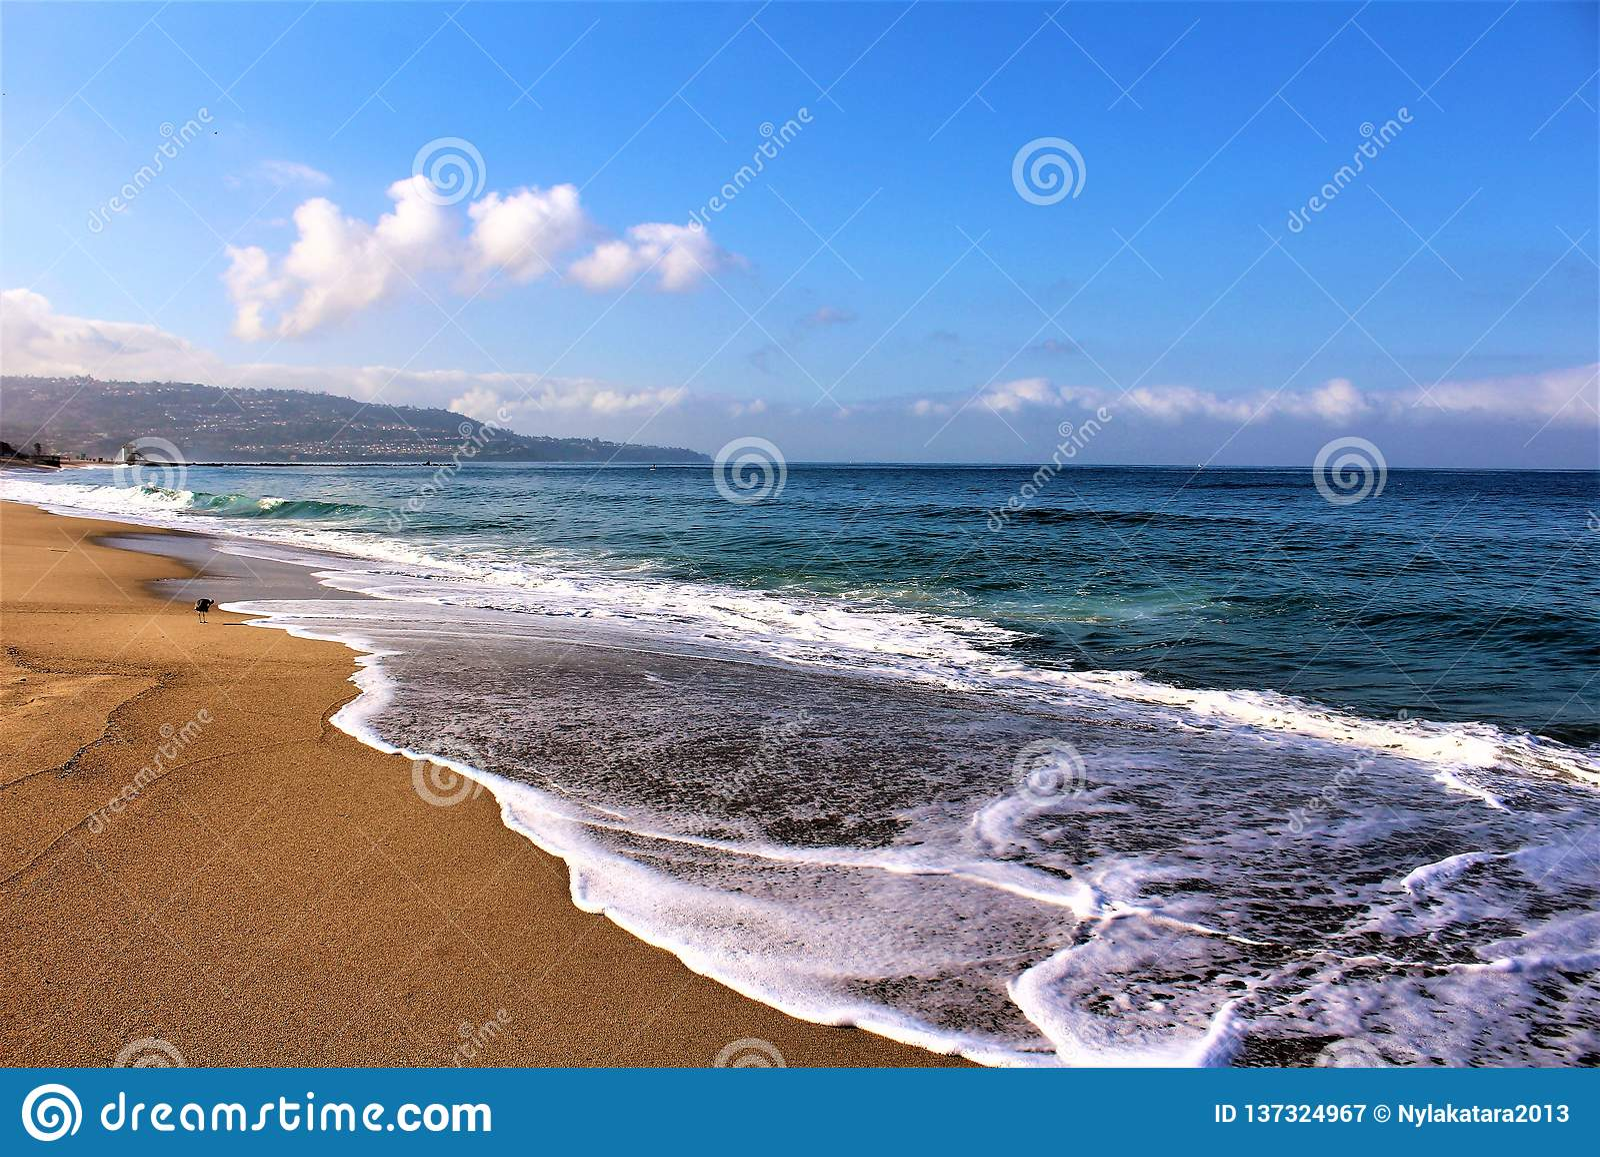 Beachfront bij Hermosa-Strand Californië in de Provincie van Los Angeles, Californië, Verenigde Staten